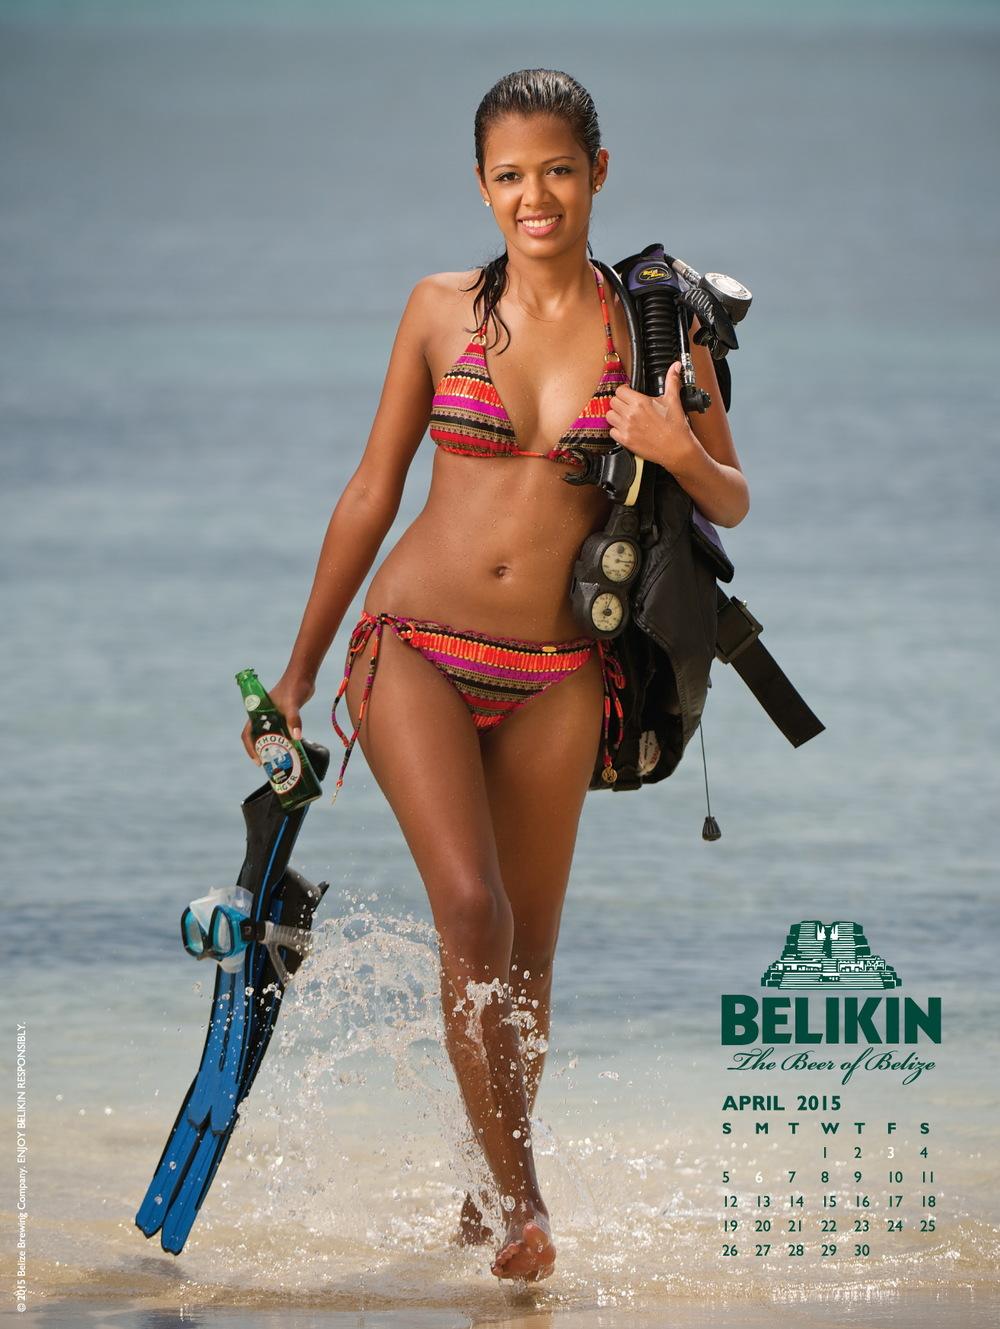 Belikin bikini calendar shoot. 2014© David Bergman